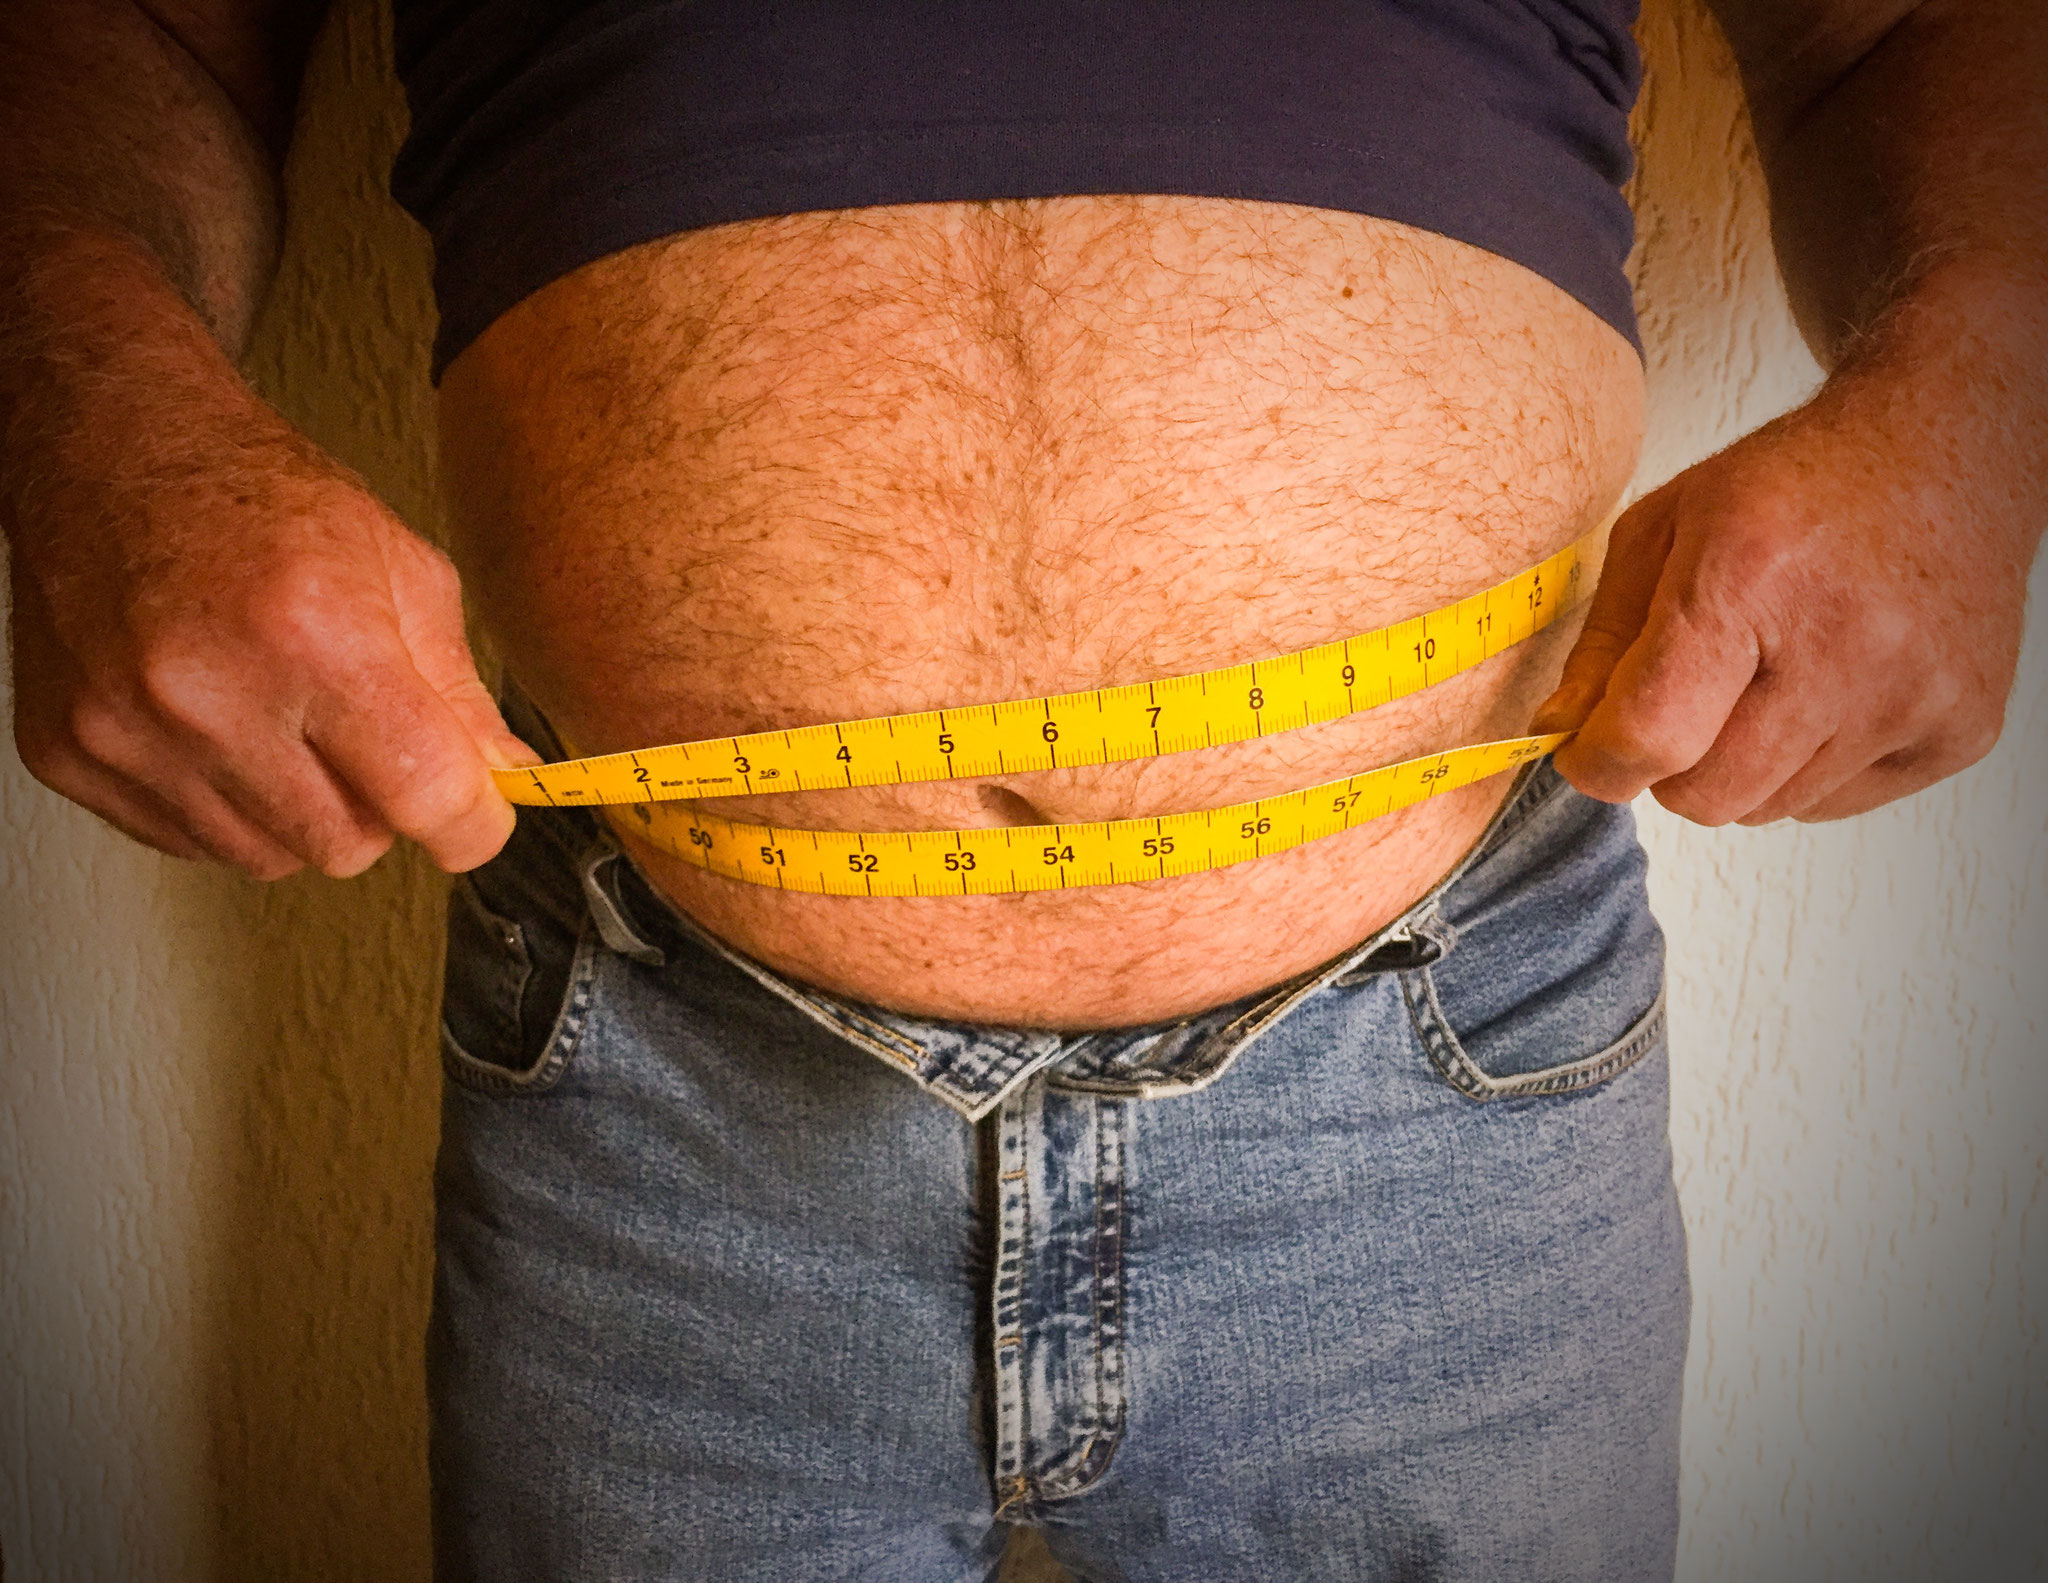 Ein paar Kilo abnehmen?